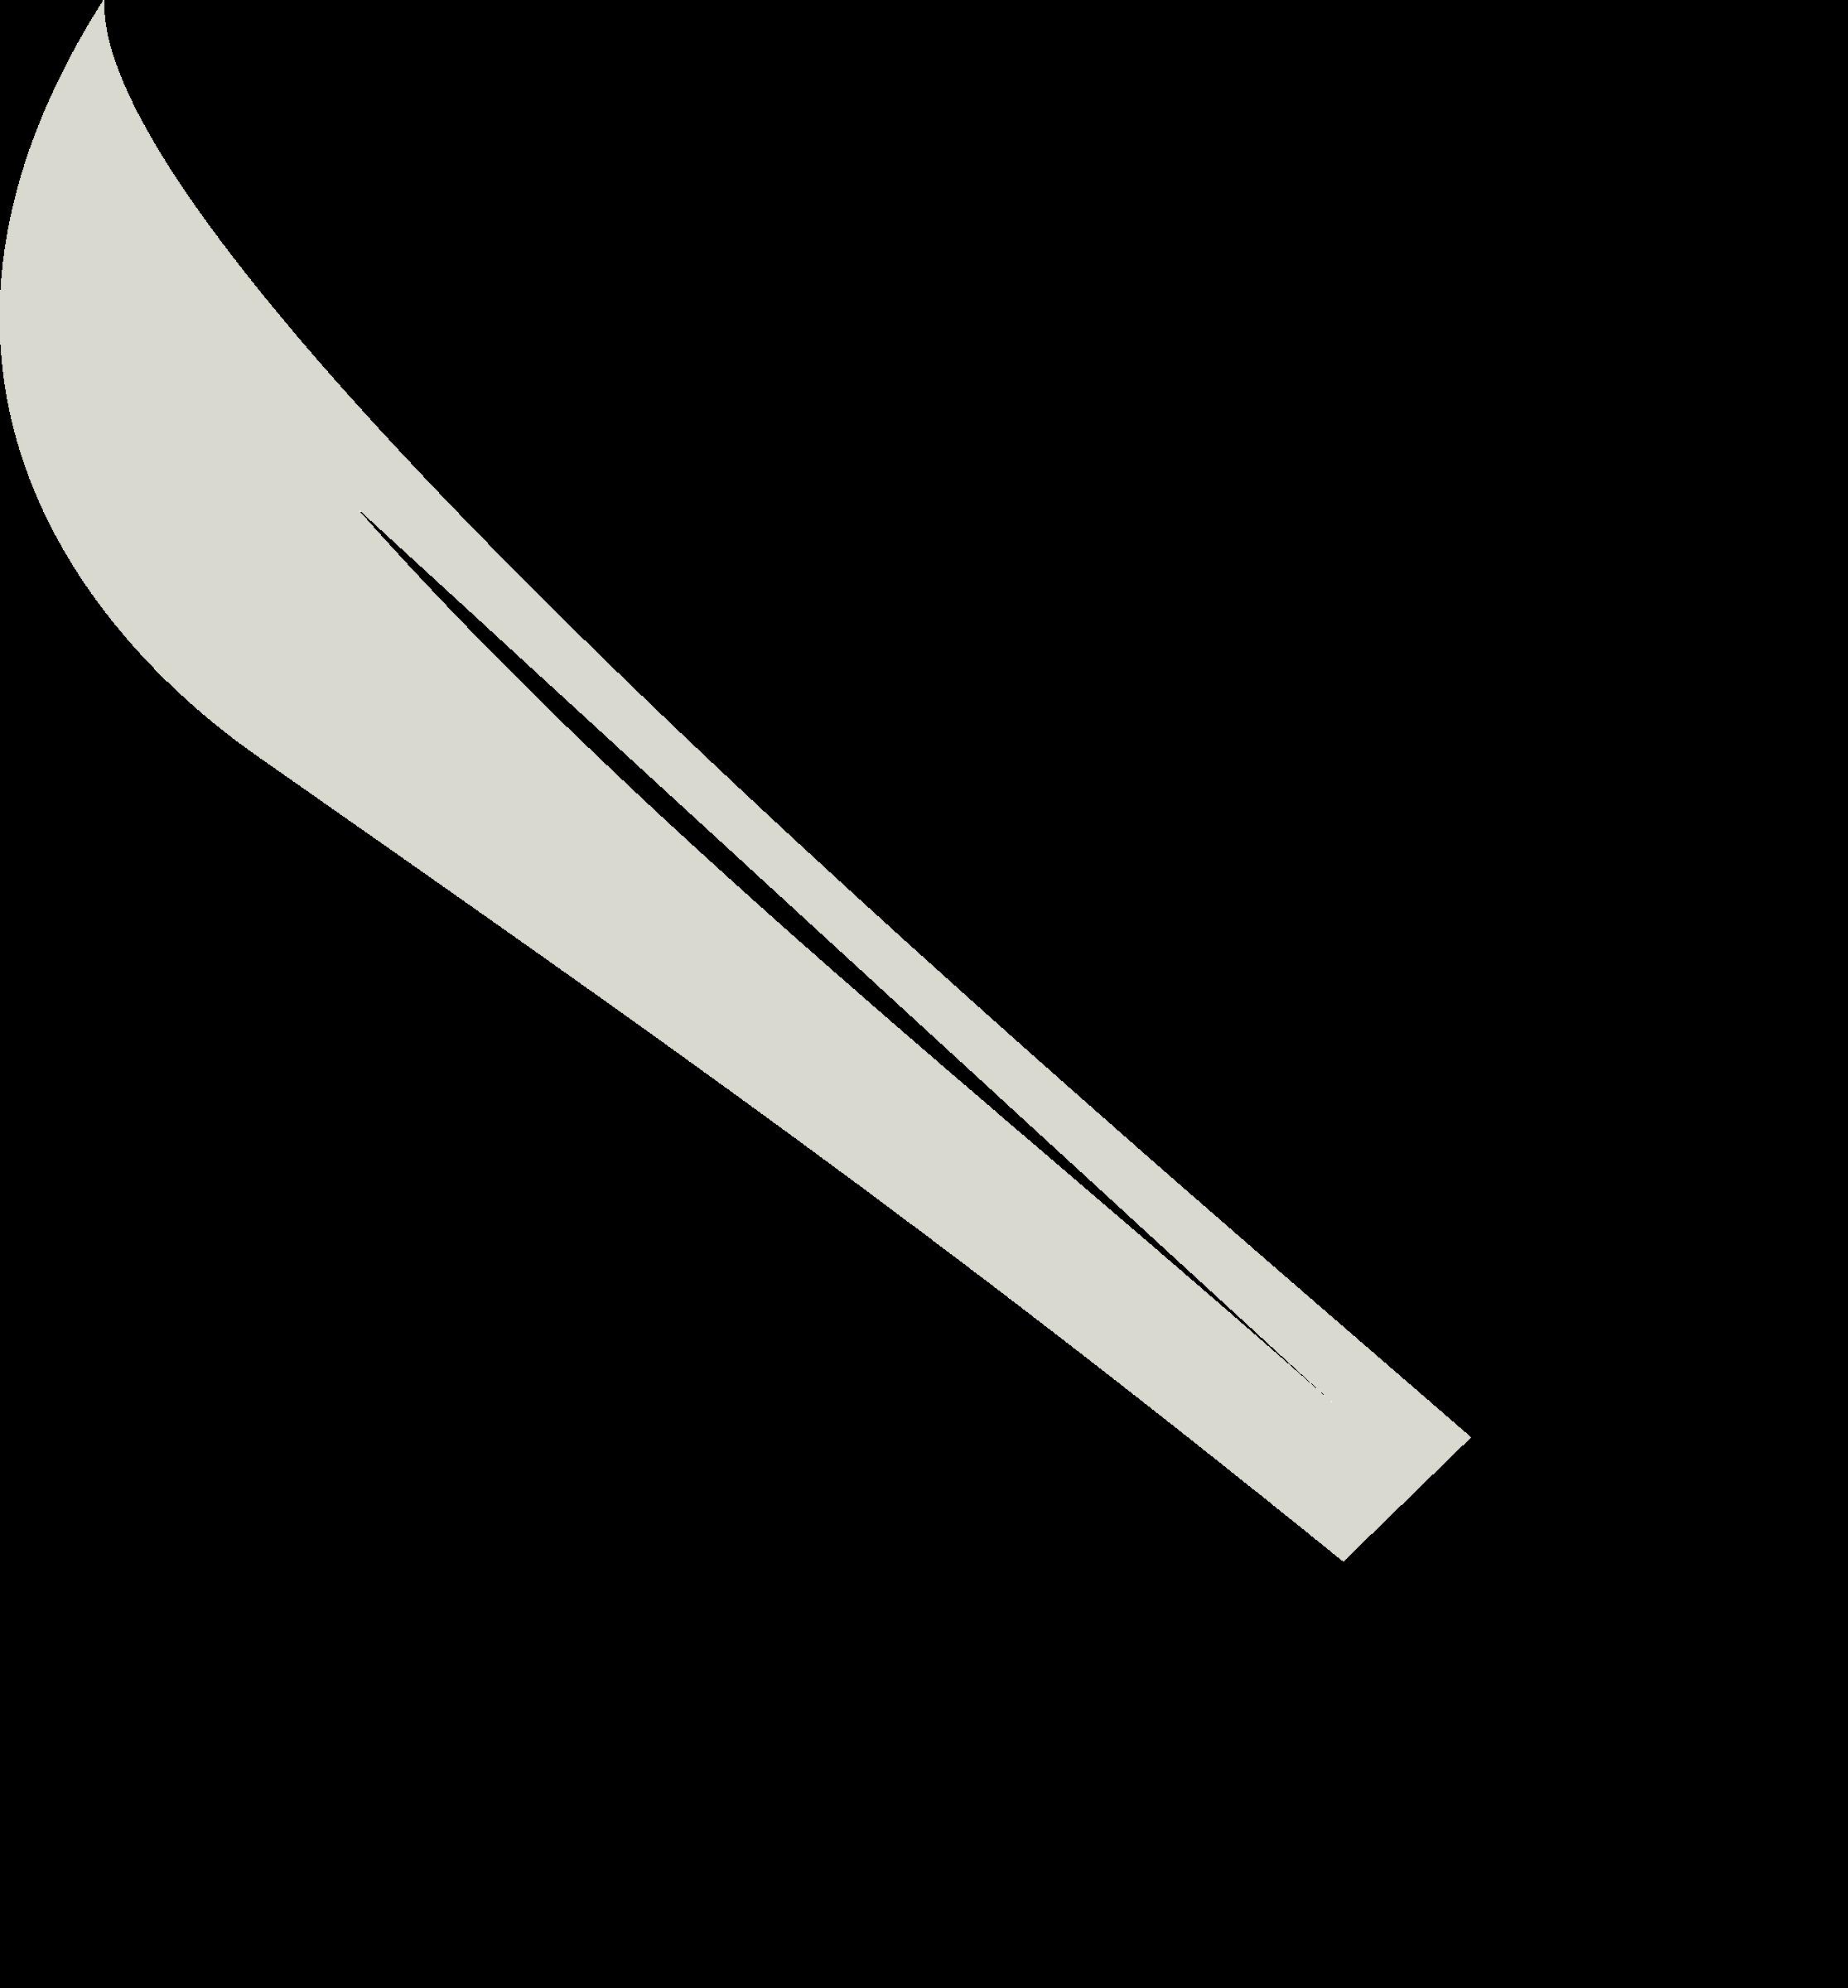 Knife Machete Clip art.